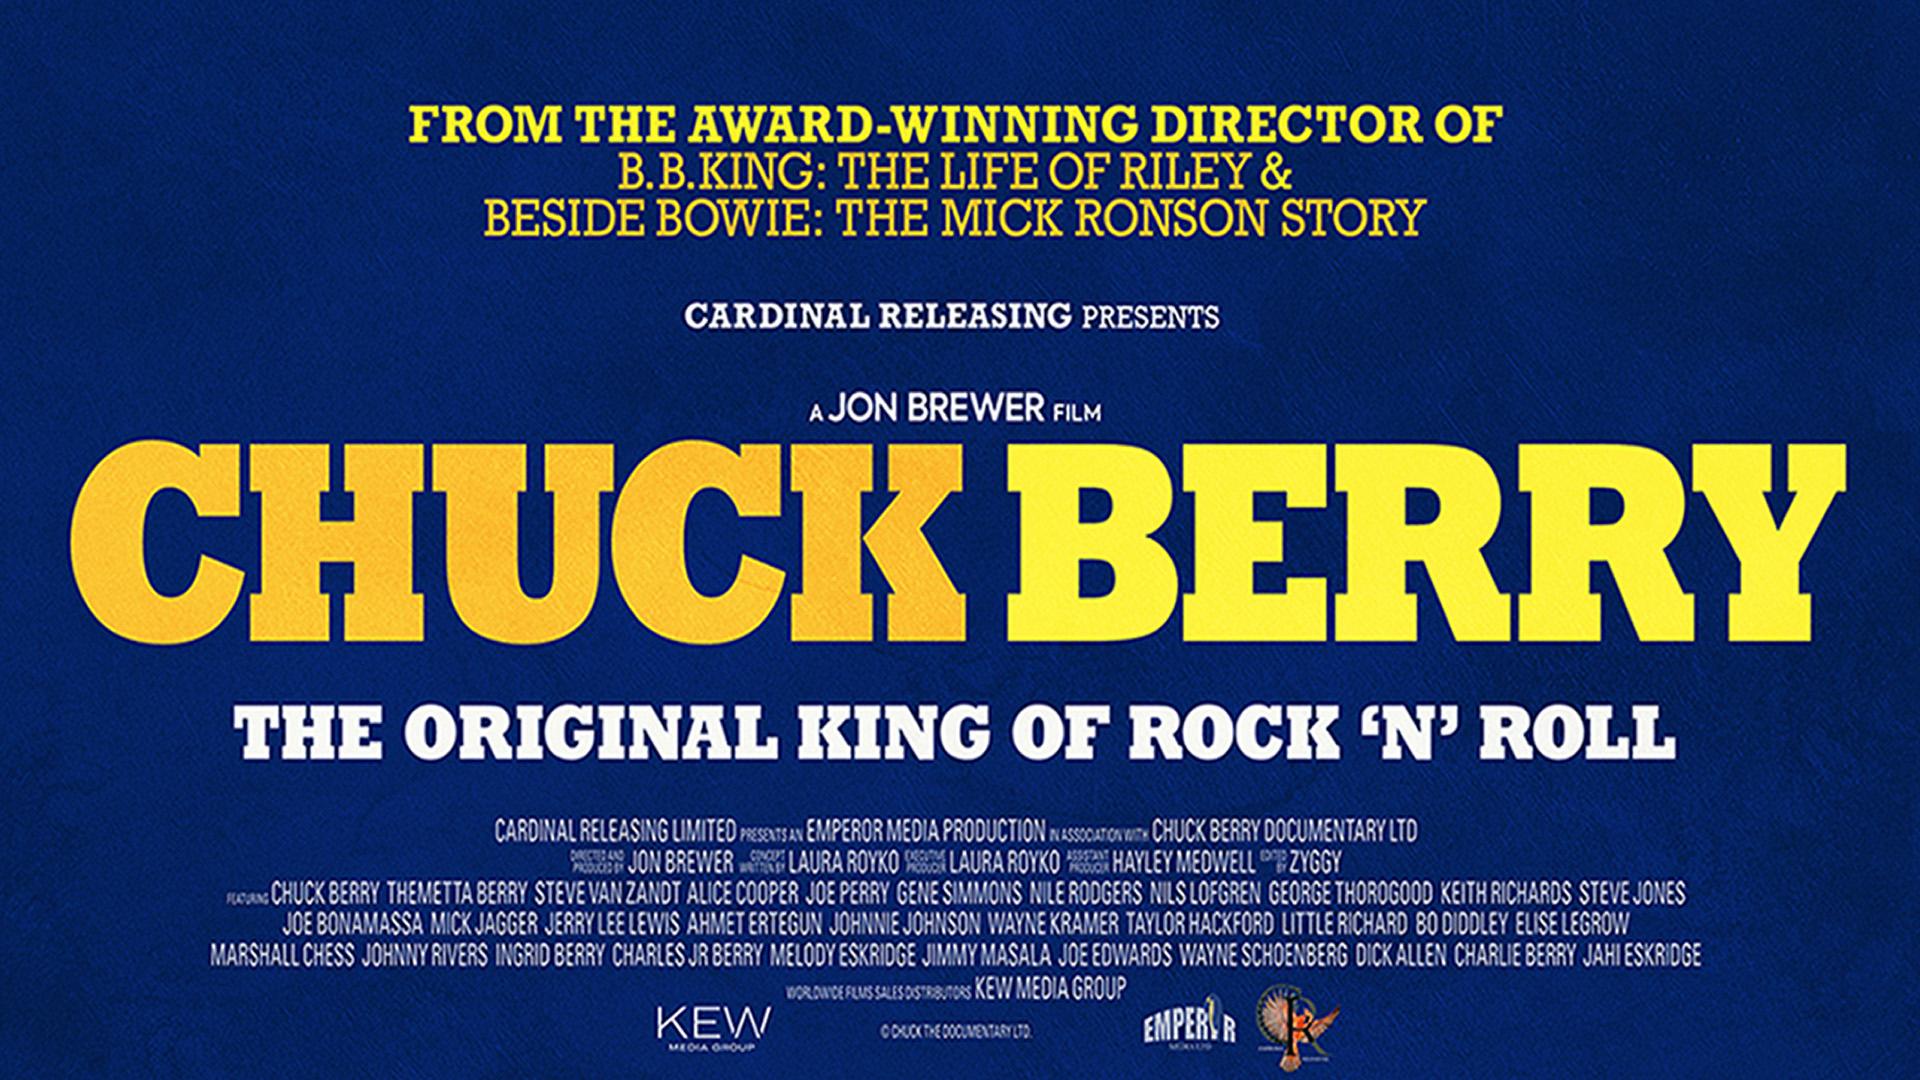 Chuck Berry - The Original King Of Rock 'n' Roll